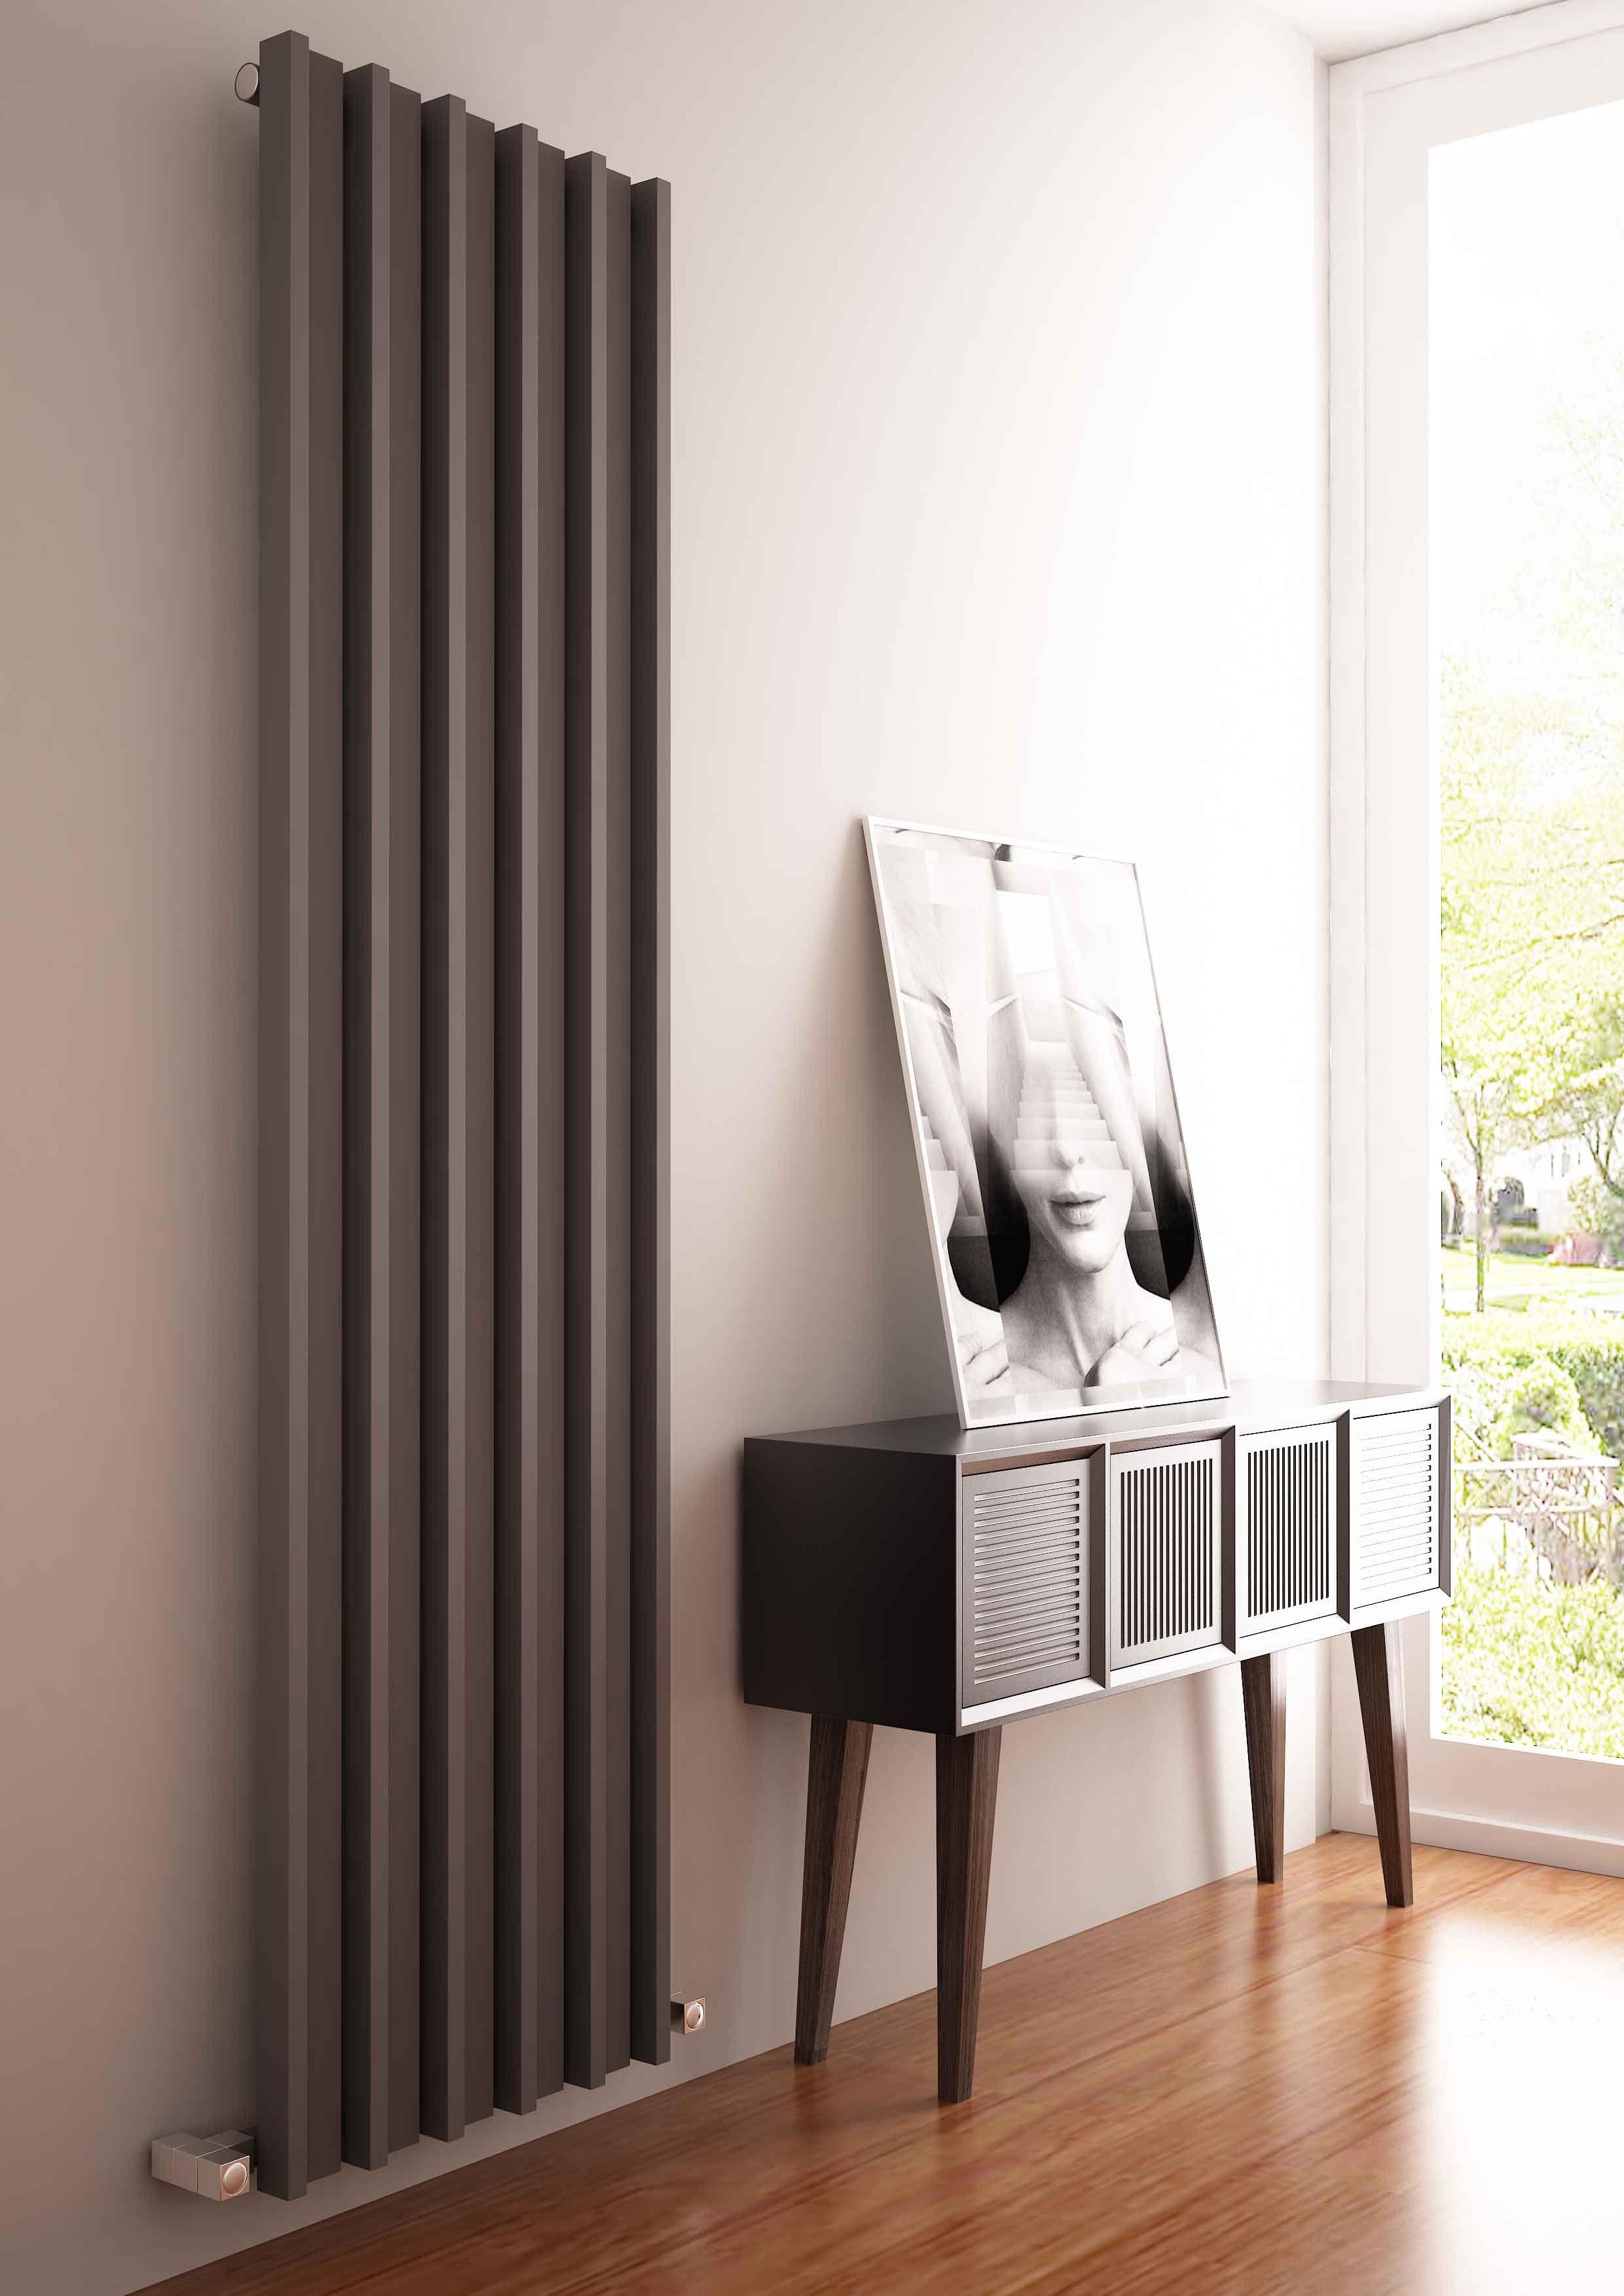 Designer Living Room Radiators: Home, Trendy Home, Interior Design